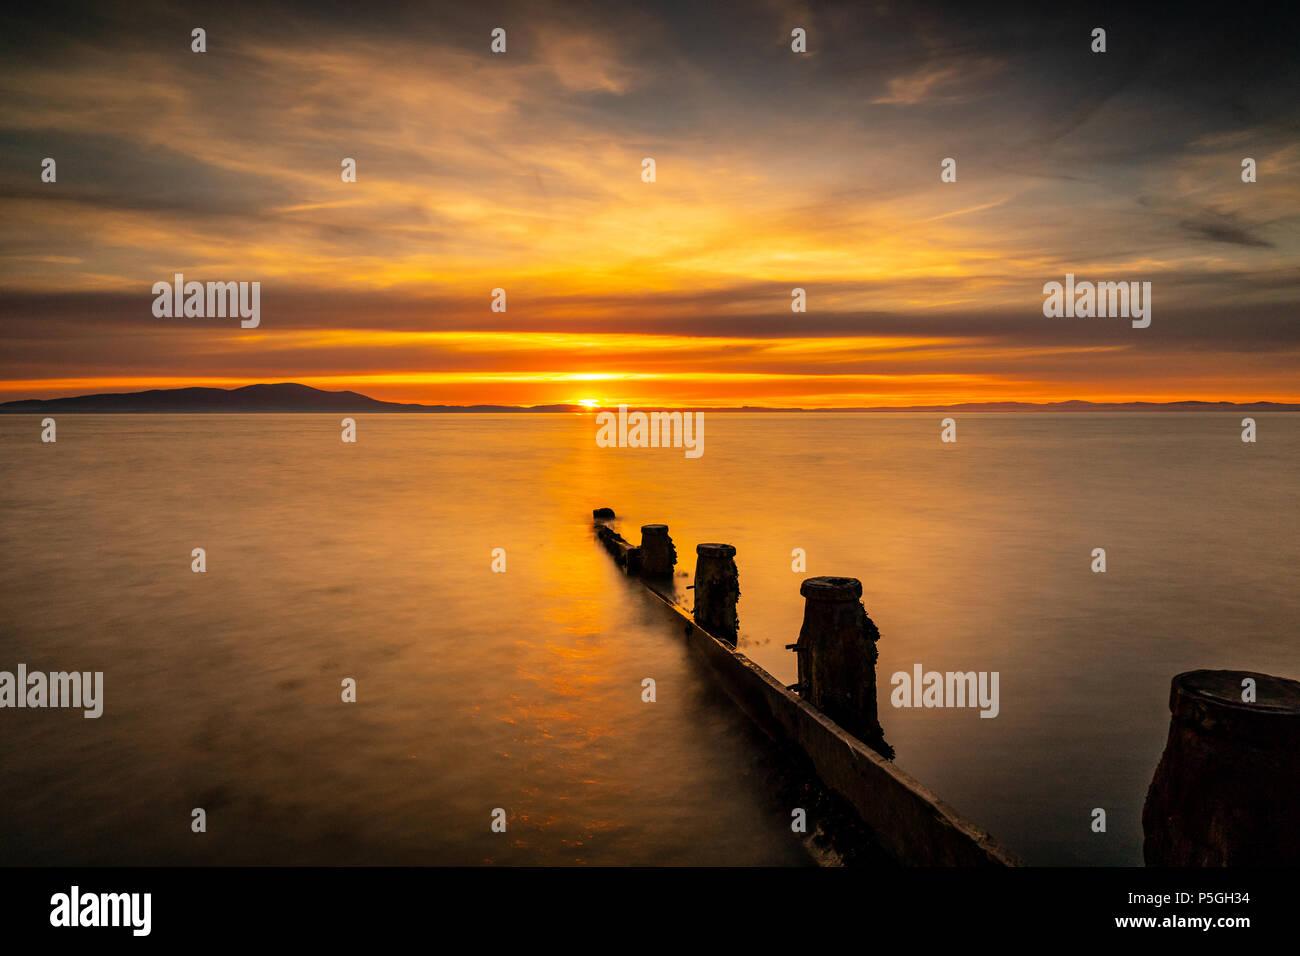 Silloth Sunset 2, Cumbria. - Stock Image